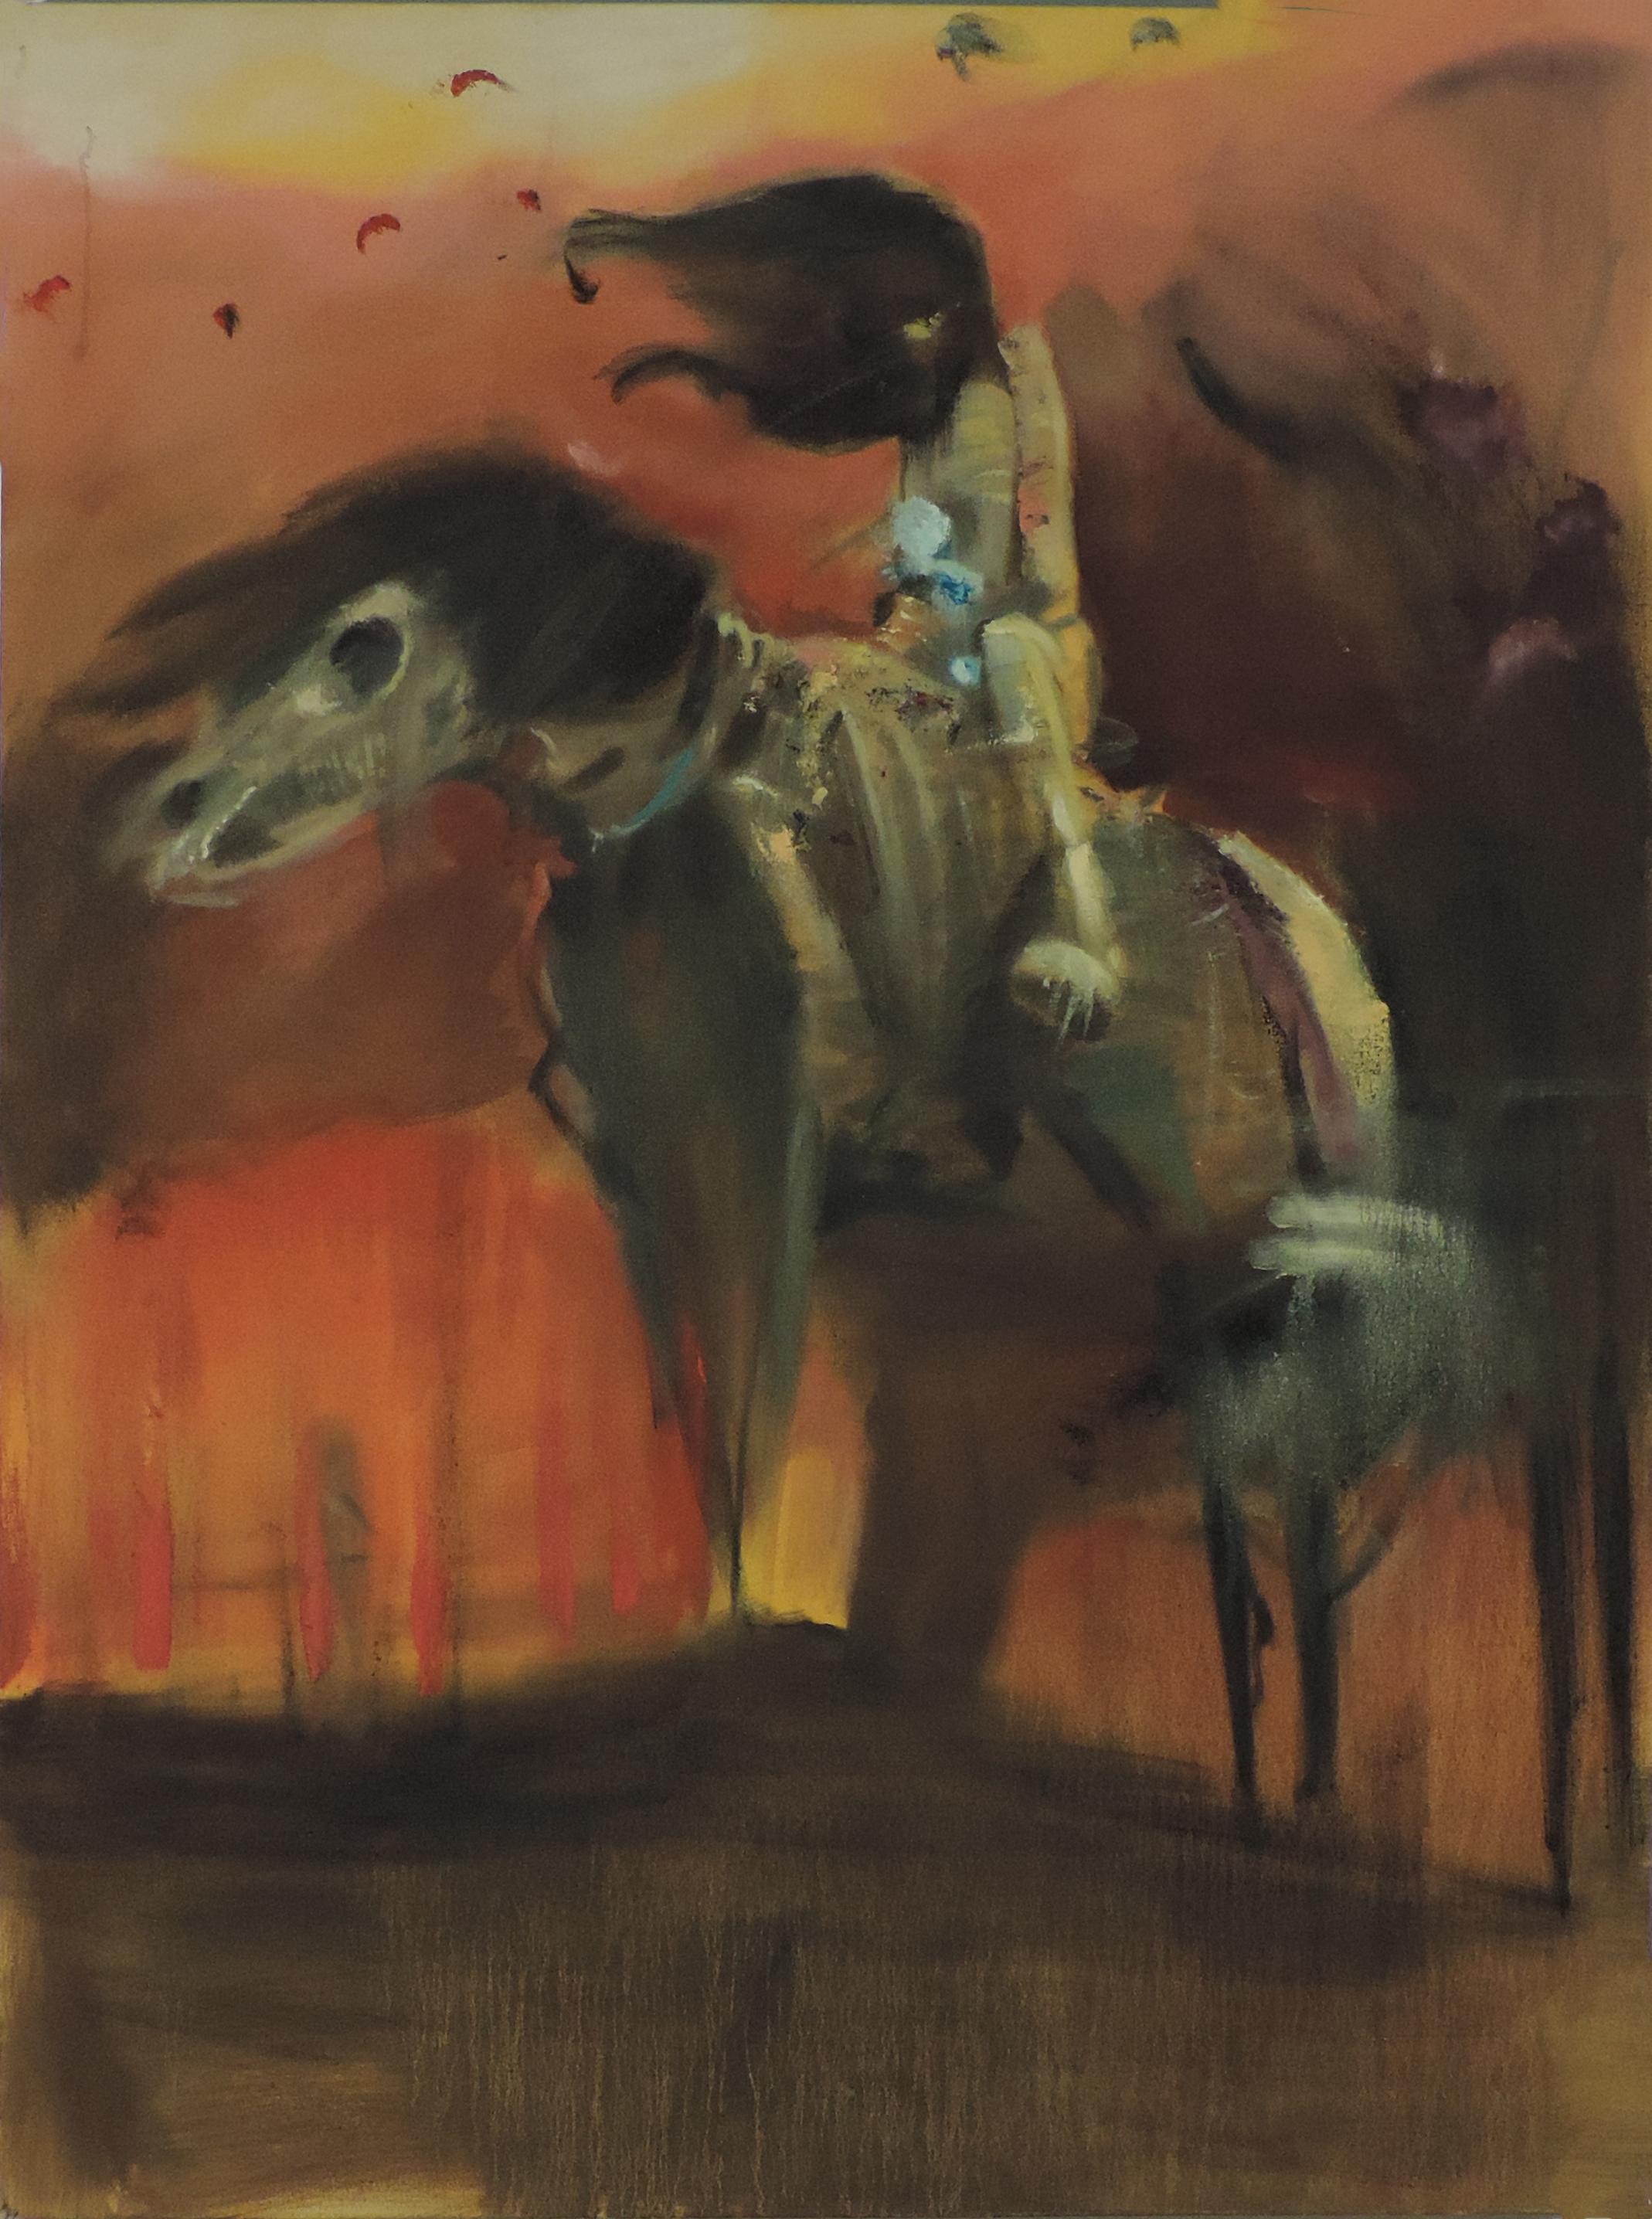 Copy of Beksinki (Untitled)  oil on canvas. 4 feet x 3 feet